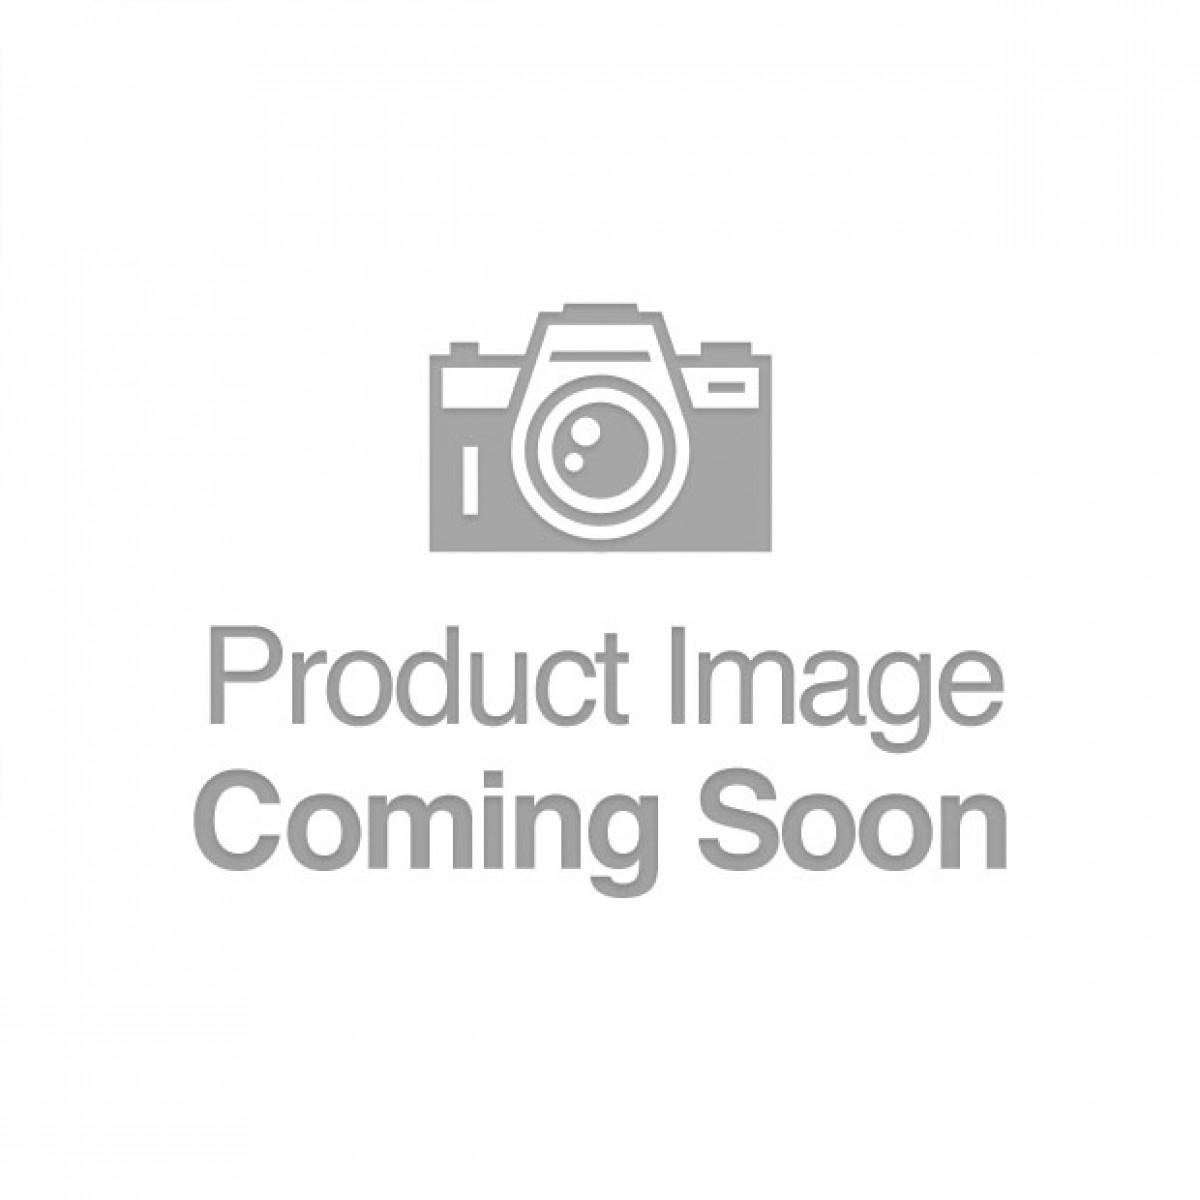 Shots Twitch Innovation Hands Free Clitoral Stimulator - Rose Gold